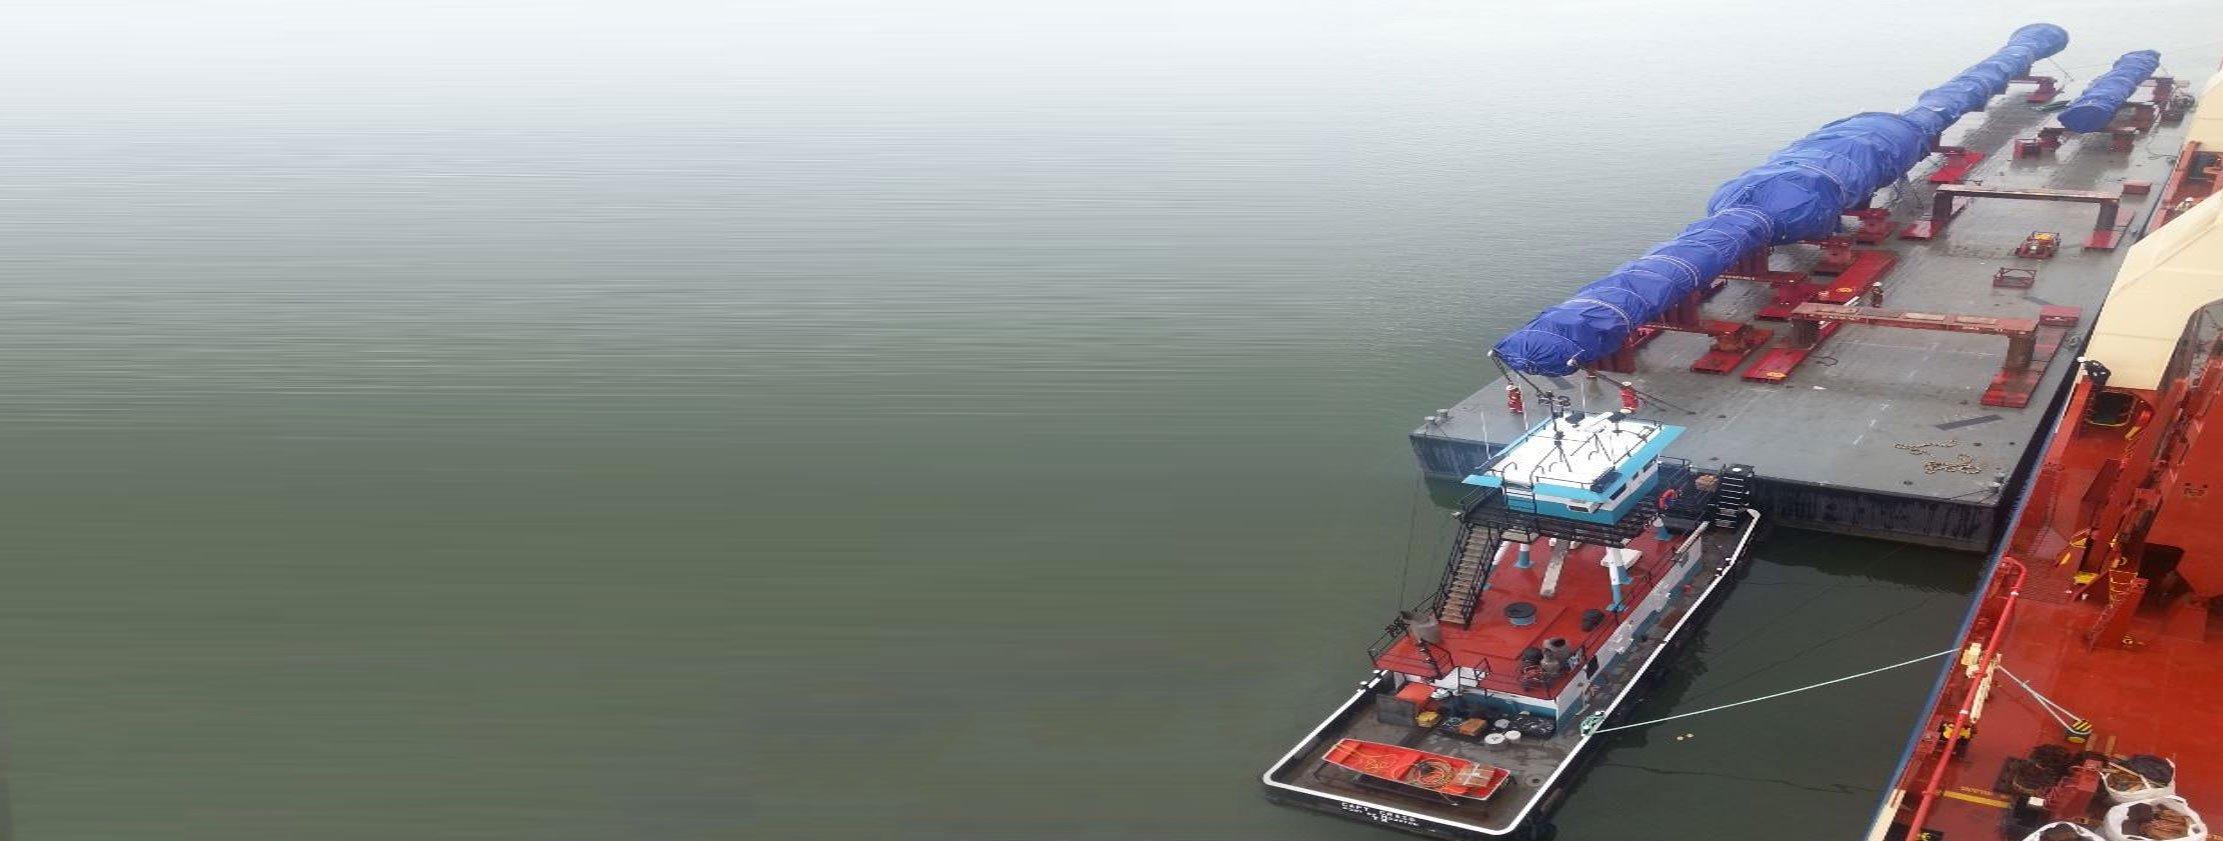 port freeport environmentally friendly